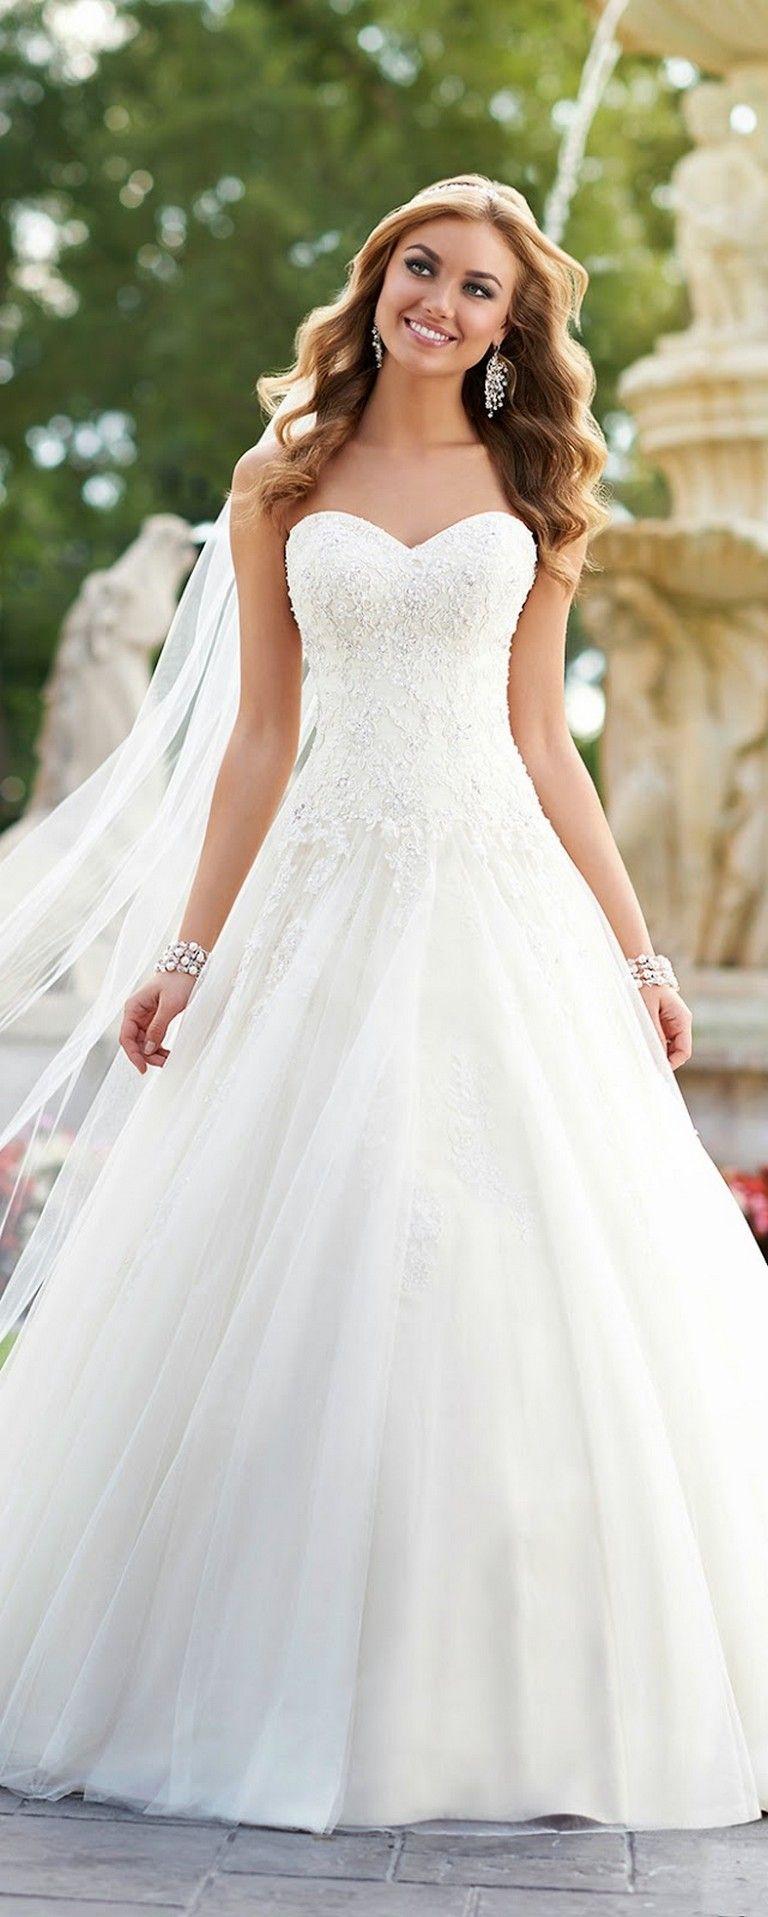 Wedding dress princess wedding dresses awesome ideas